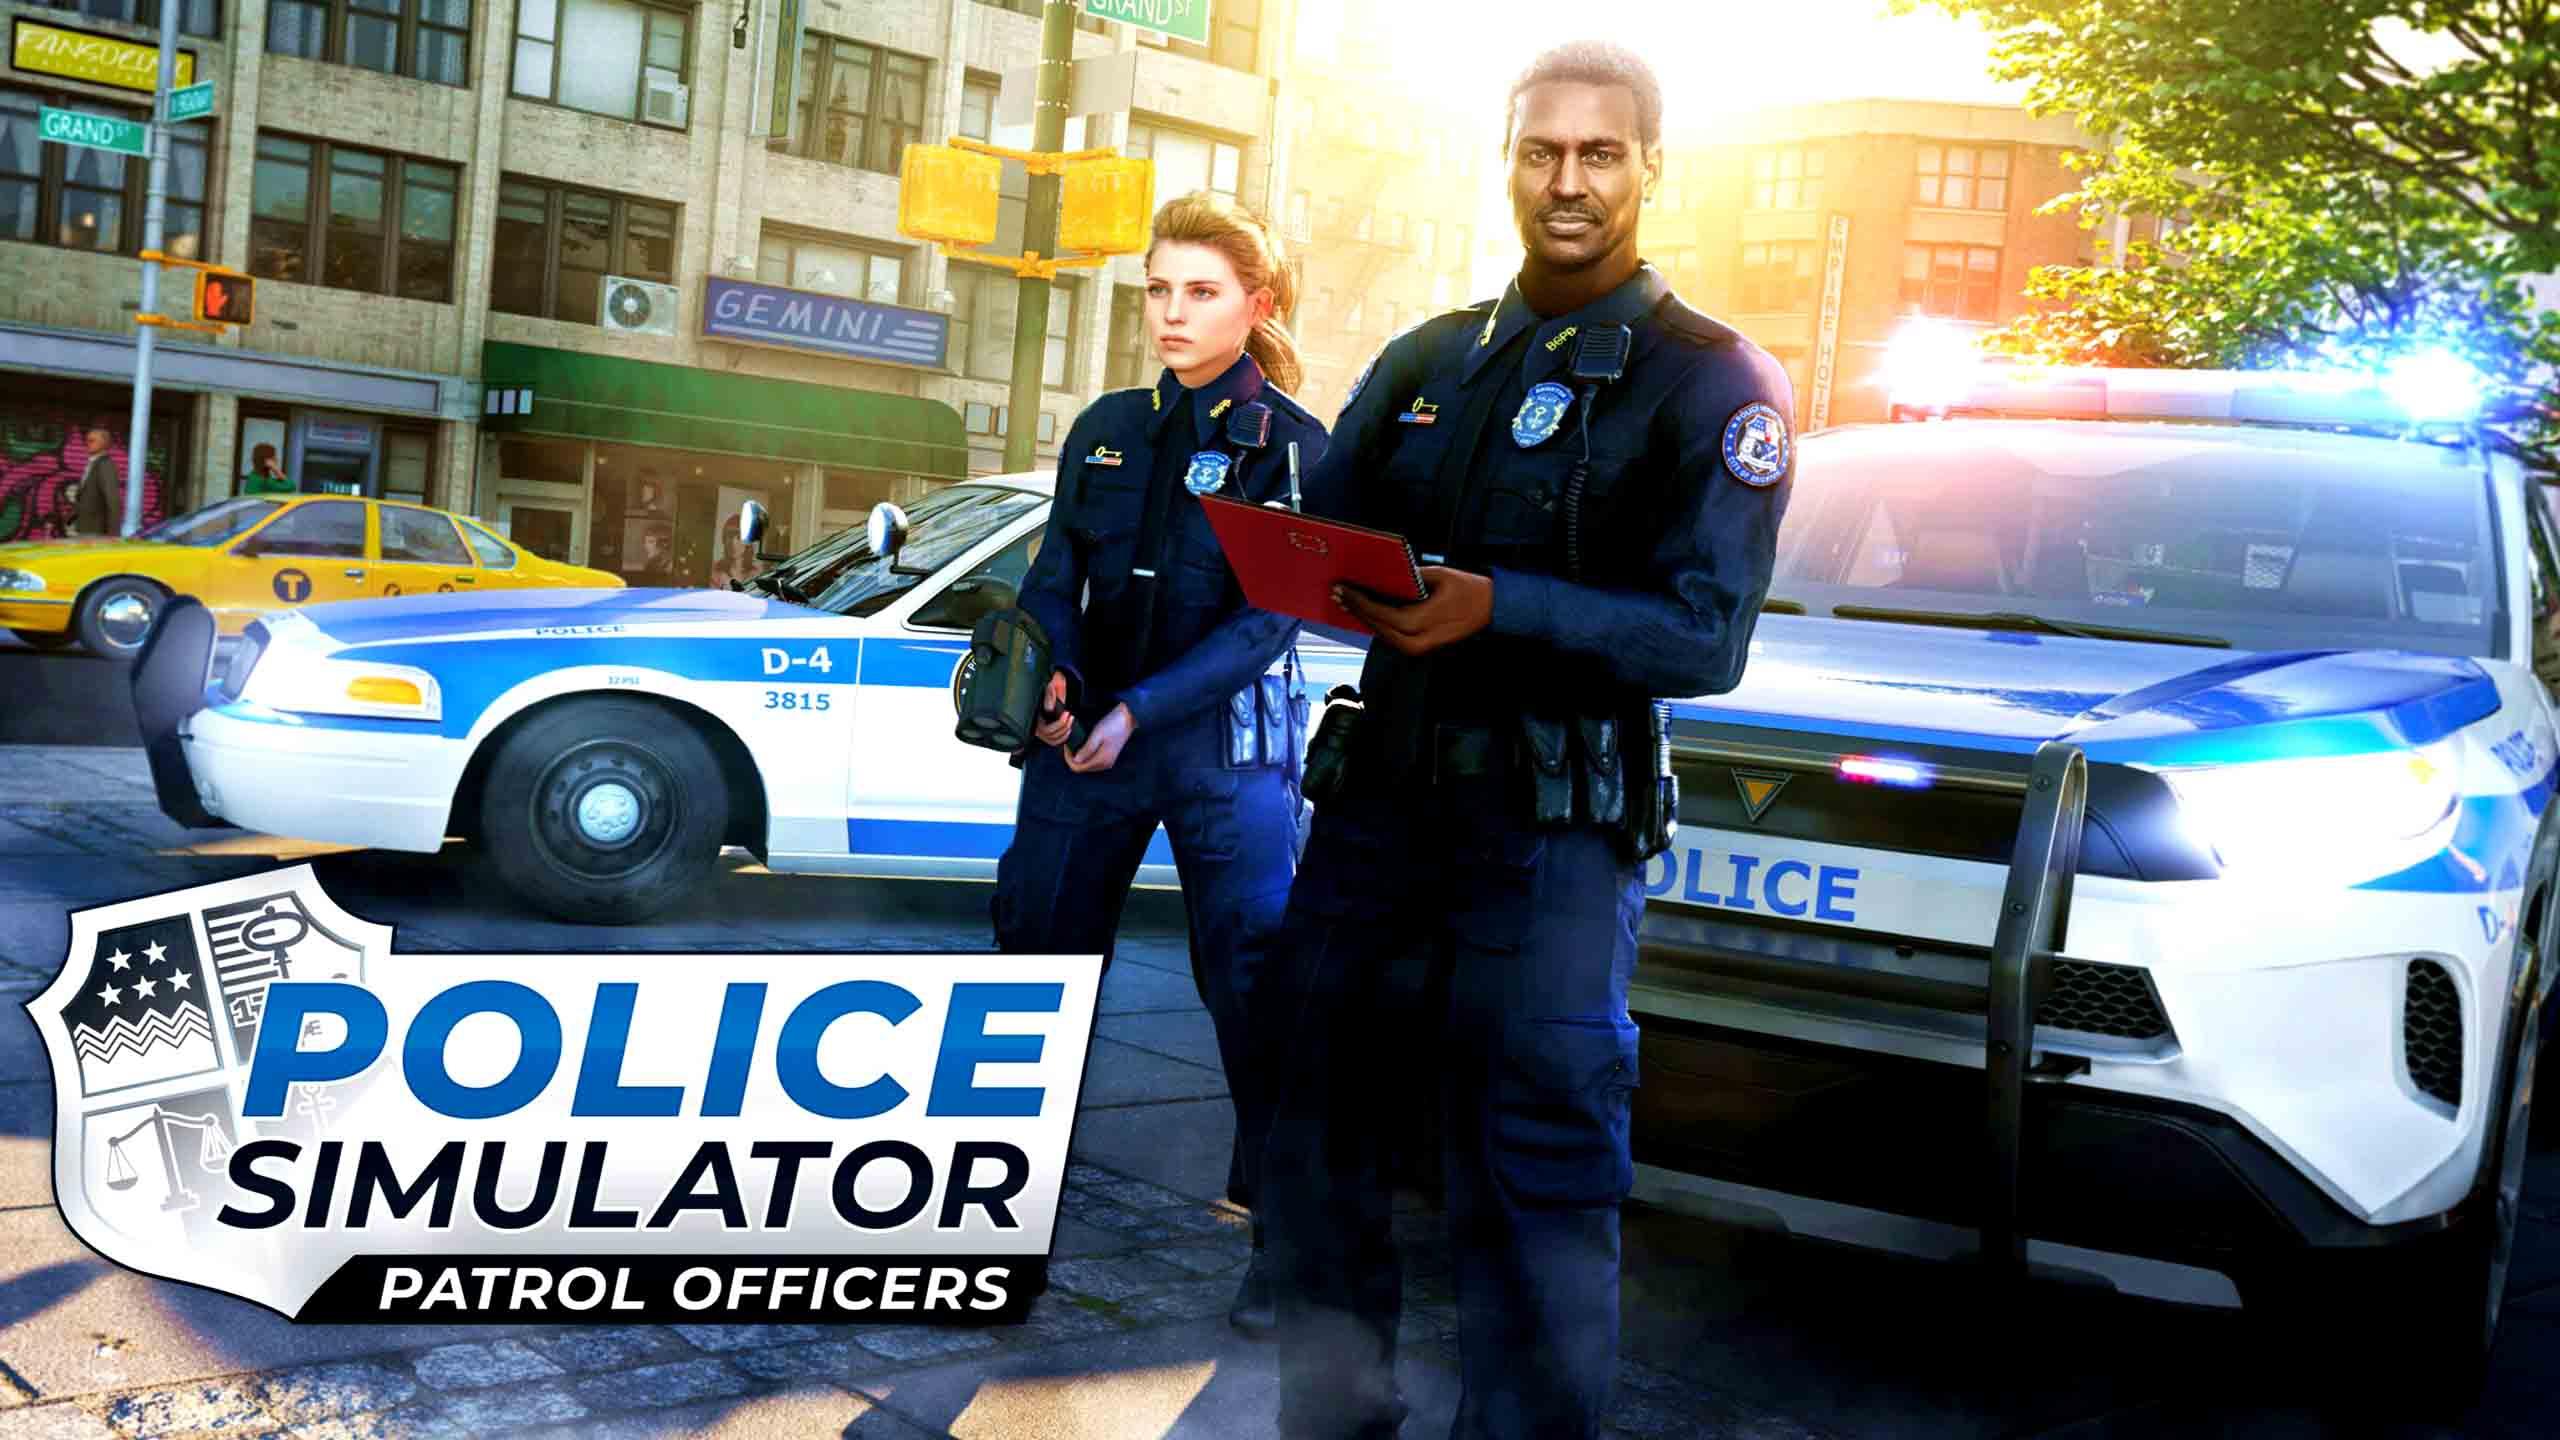 Police Simulator: Patrol Officers Free Download (v1.0.3) » SteamRiP